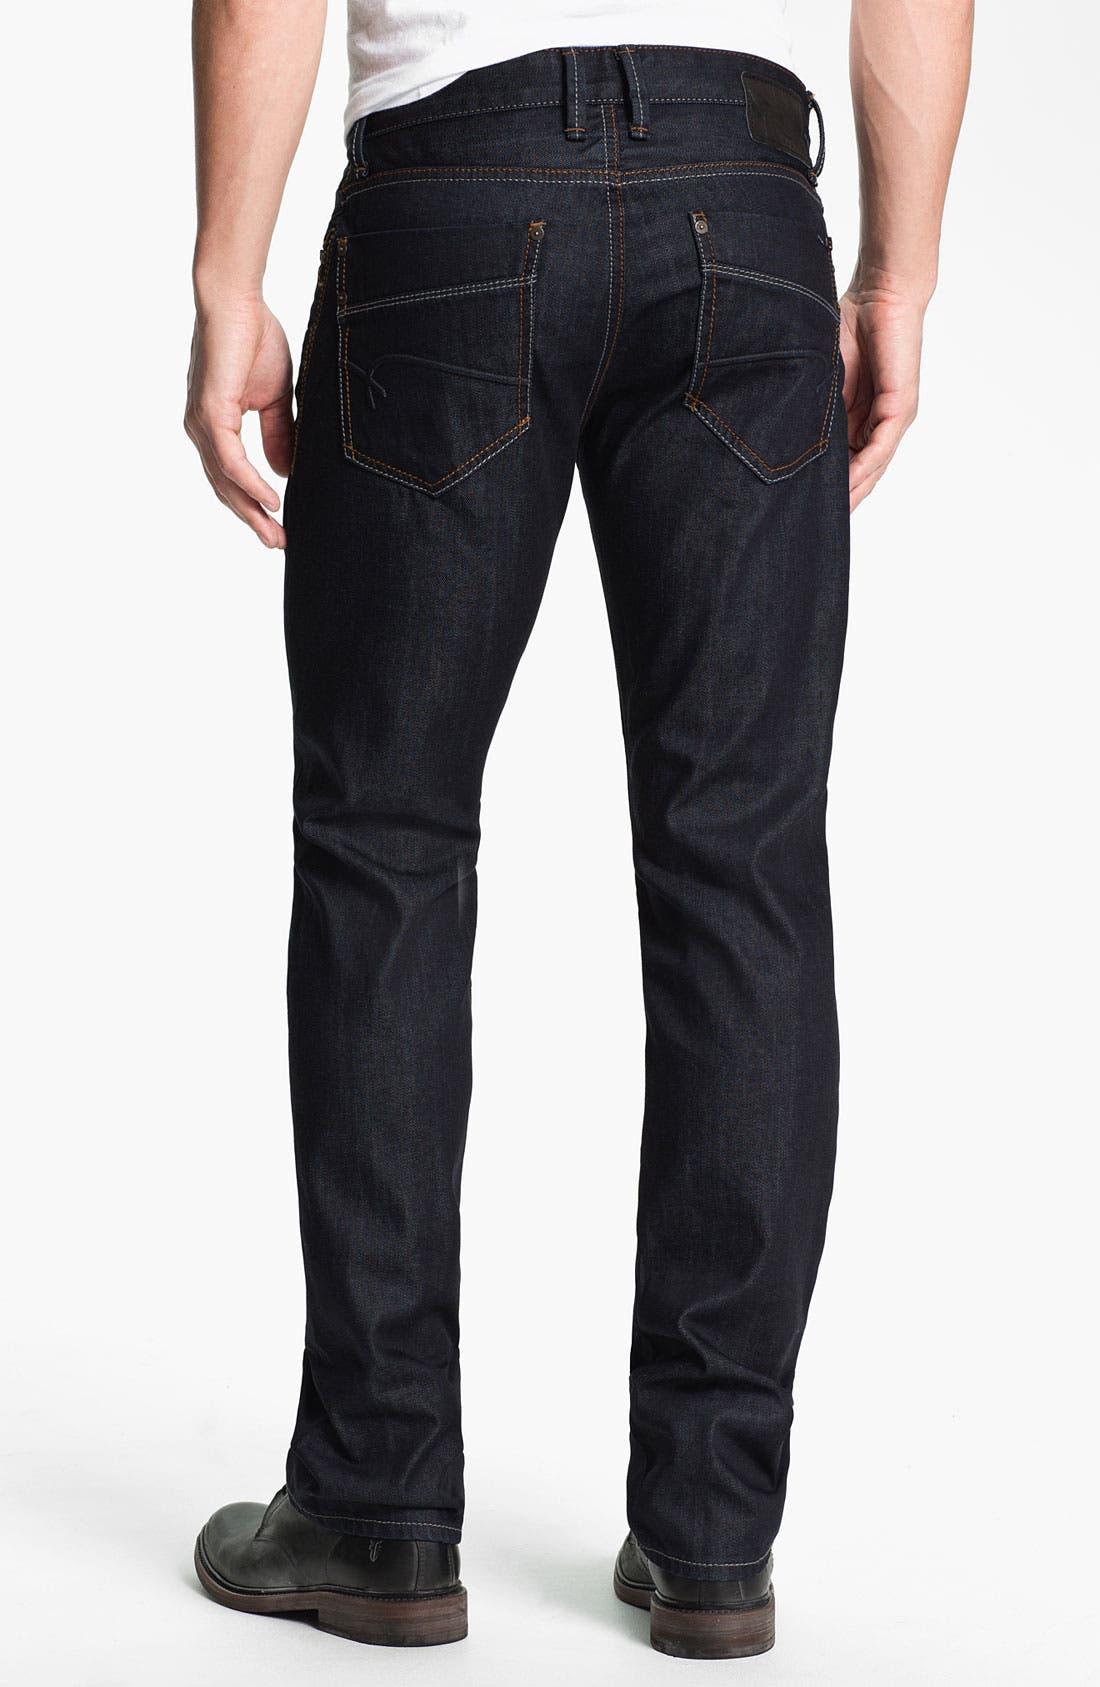 Alternate Image 1 Selected - Mavi Jeans 'Zach' Straight Leg Jeans (Rinse Jameson)